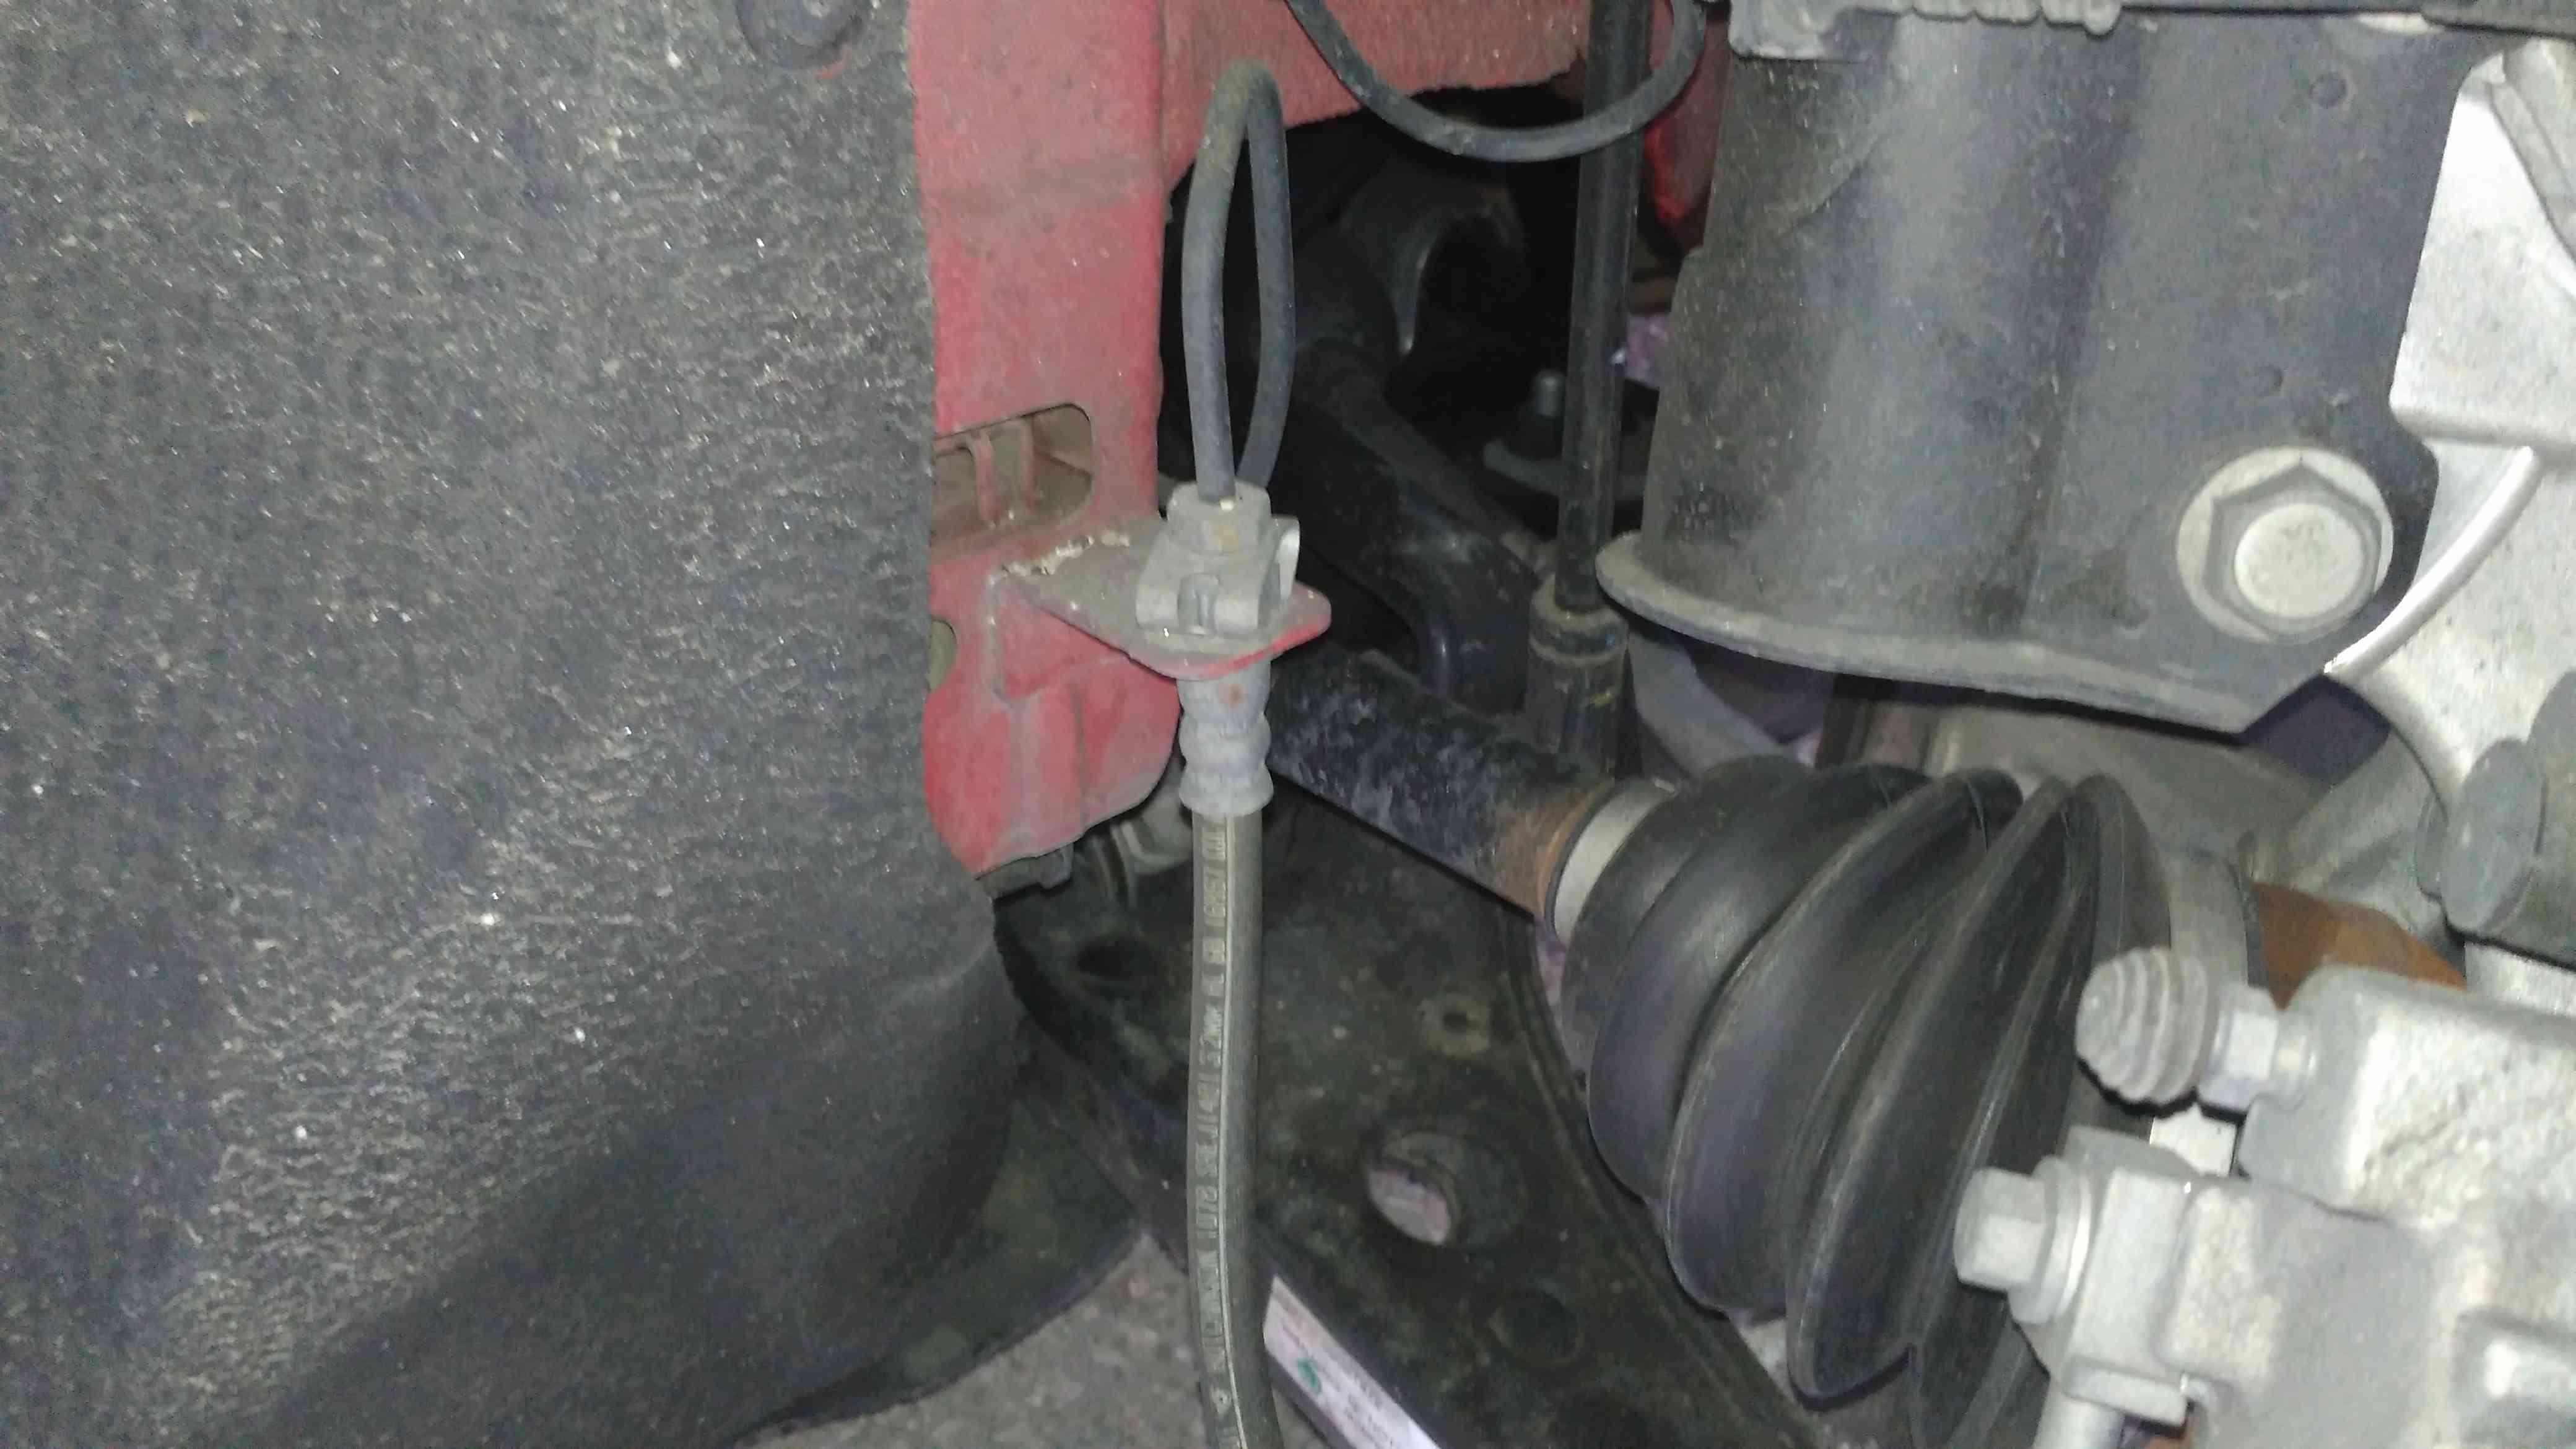 Palier izquierdo oxidado 1.4 turbo 125cv - Página 6 Img_2011